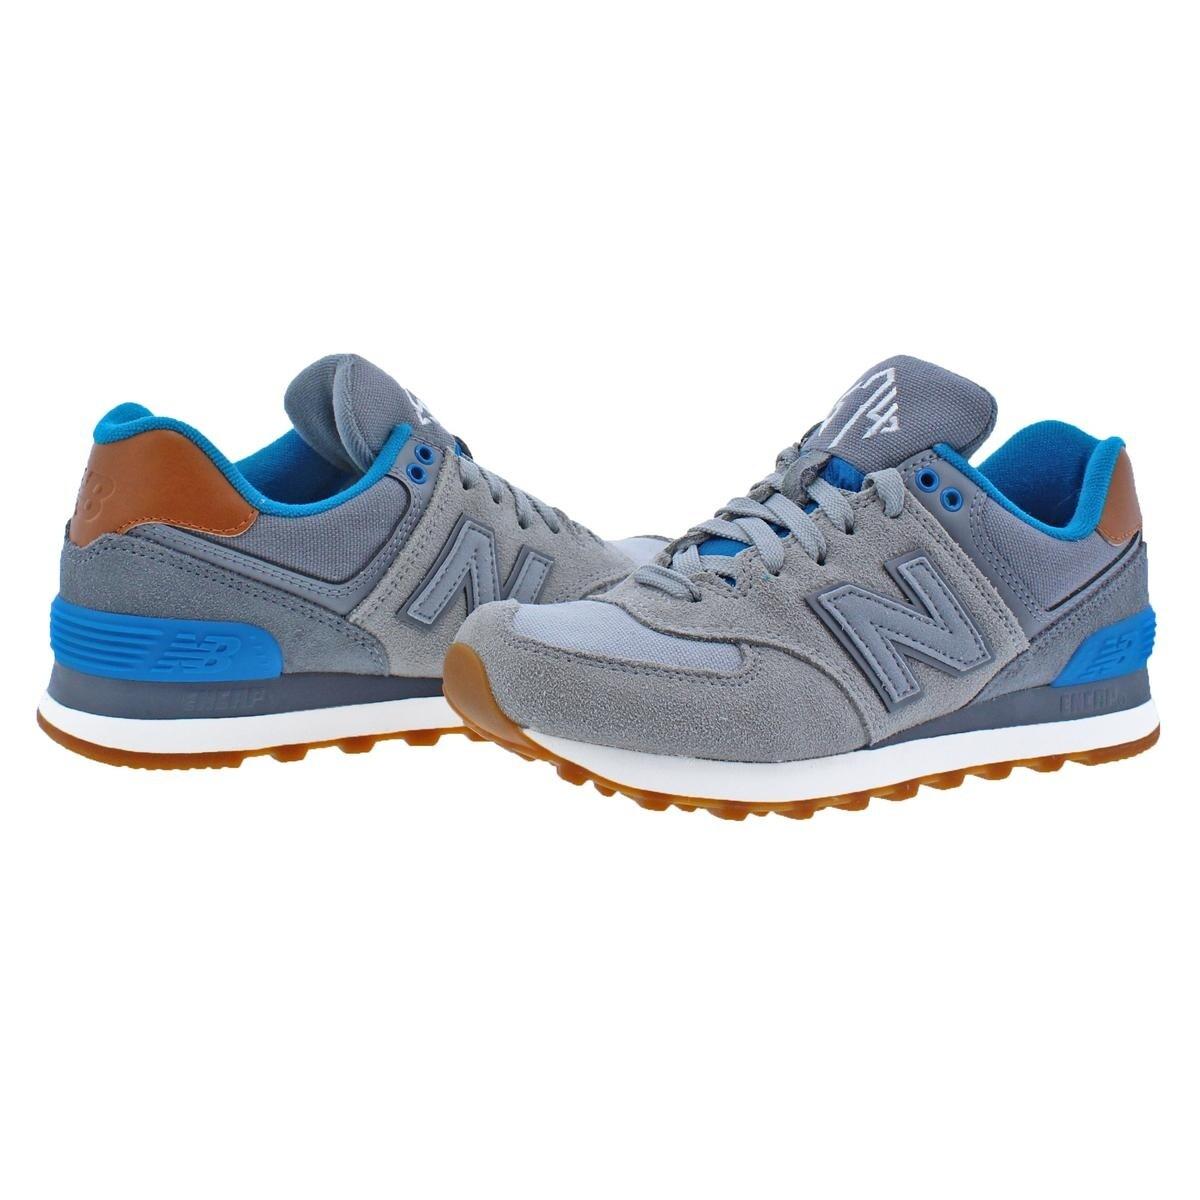 Casual Womens Low Running Balance New Shop Shoes 574 Classics Top 7nqazx0EwB